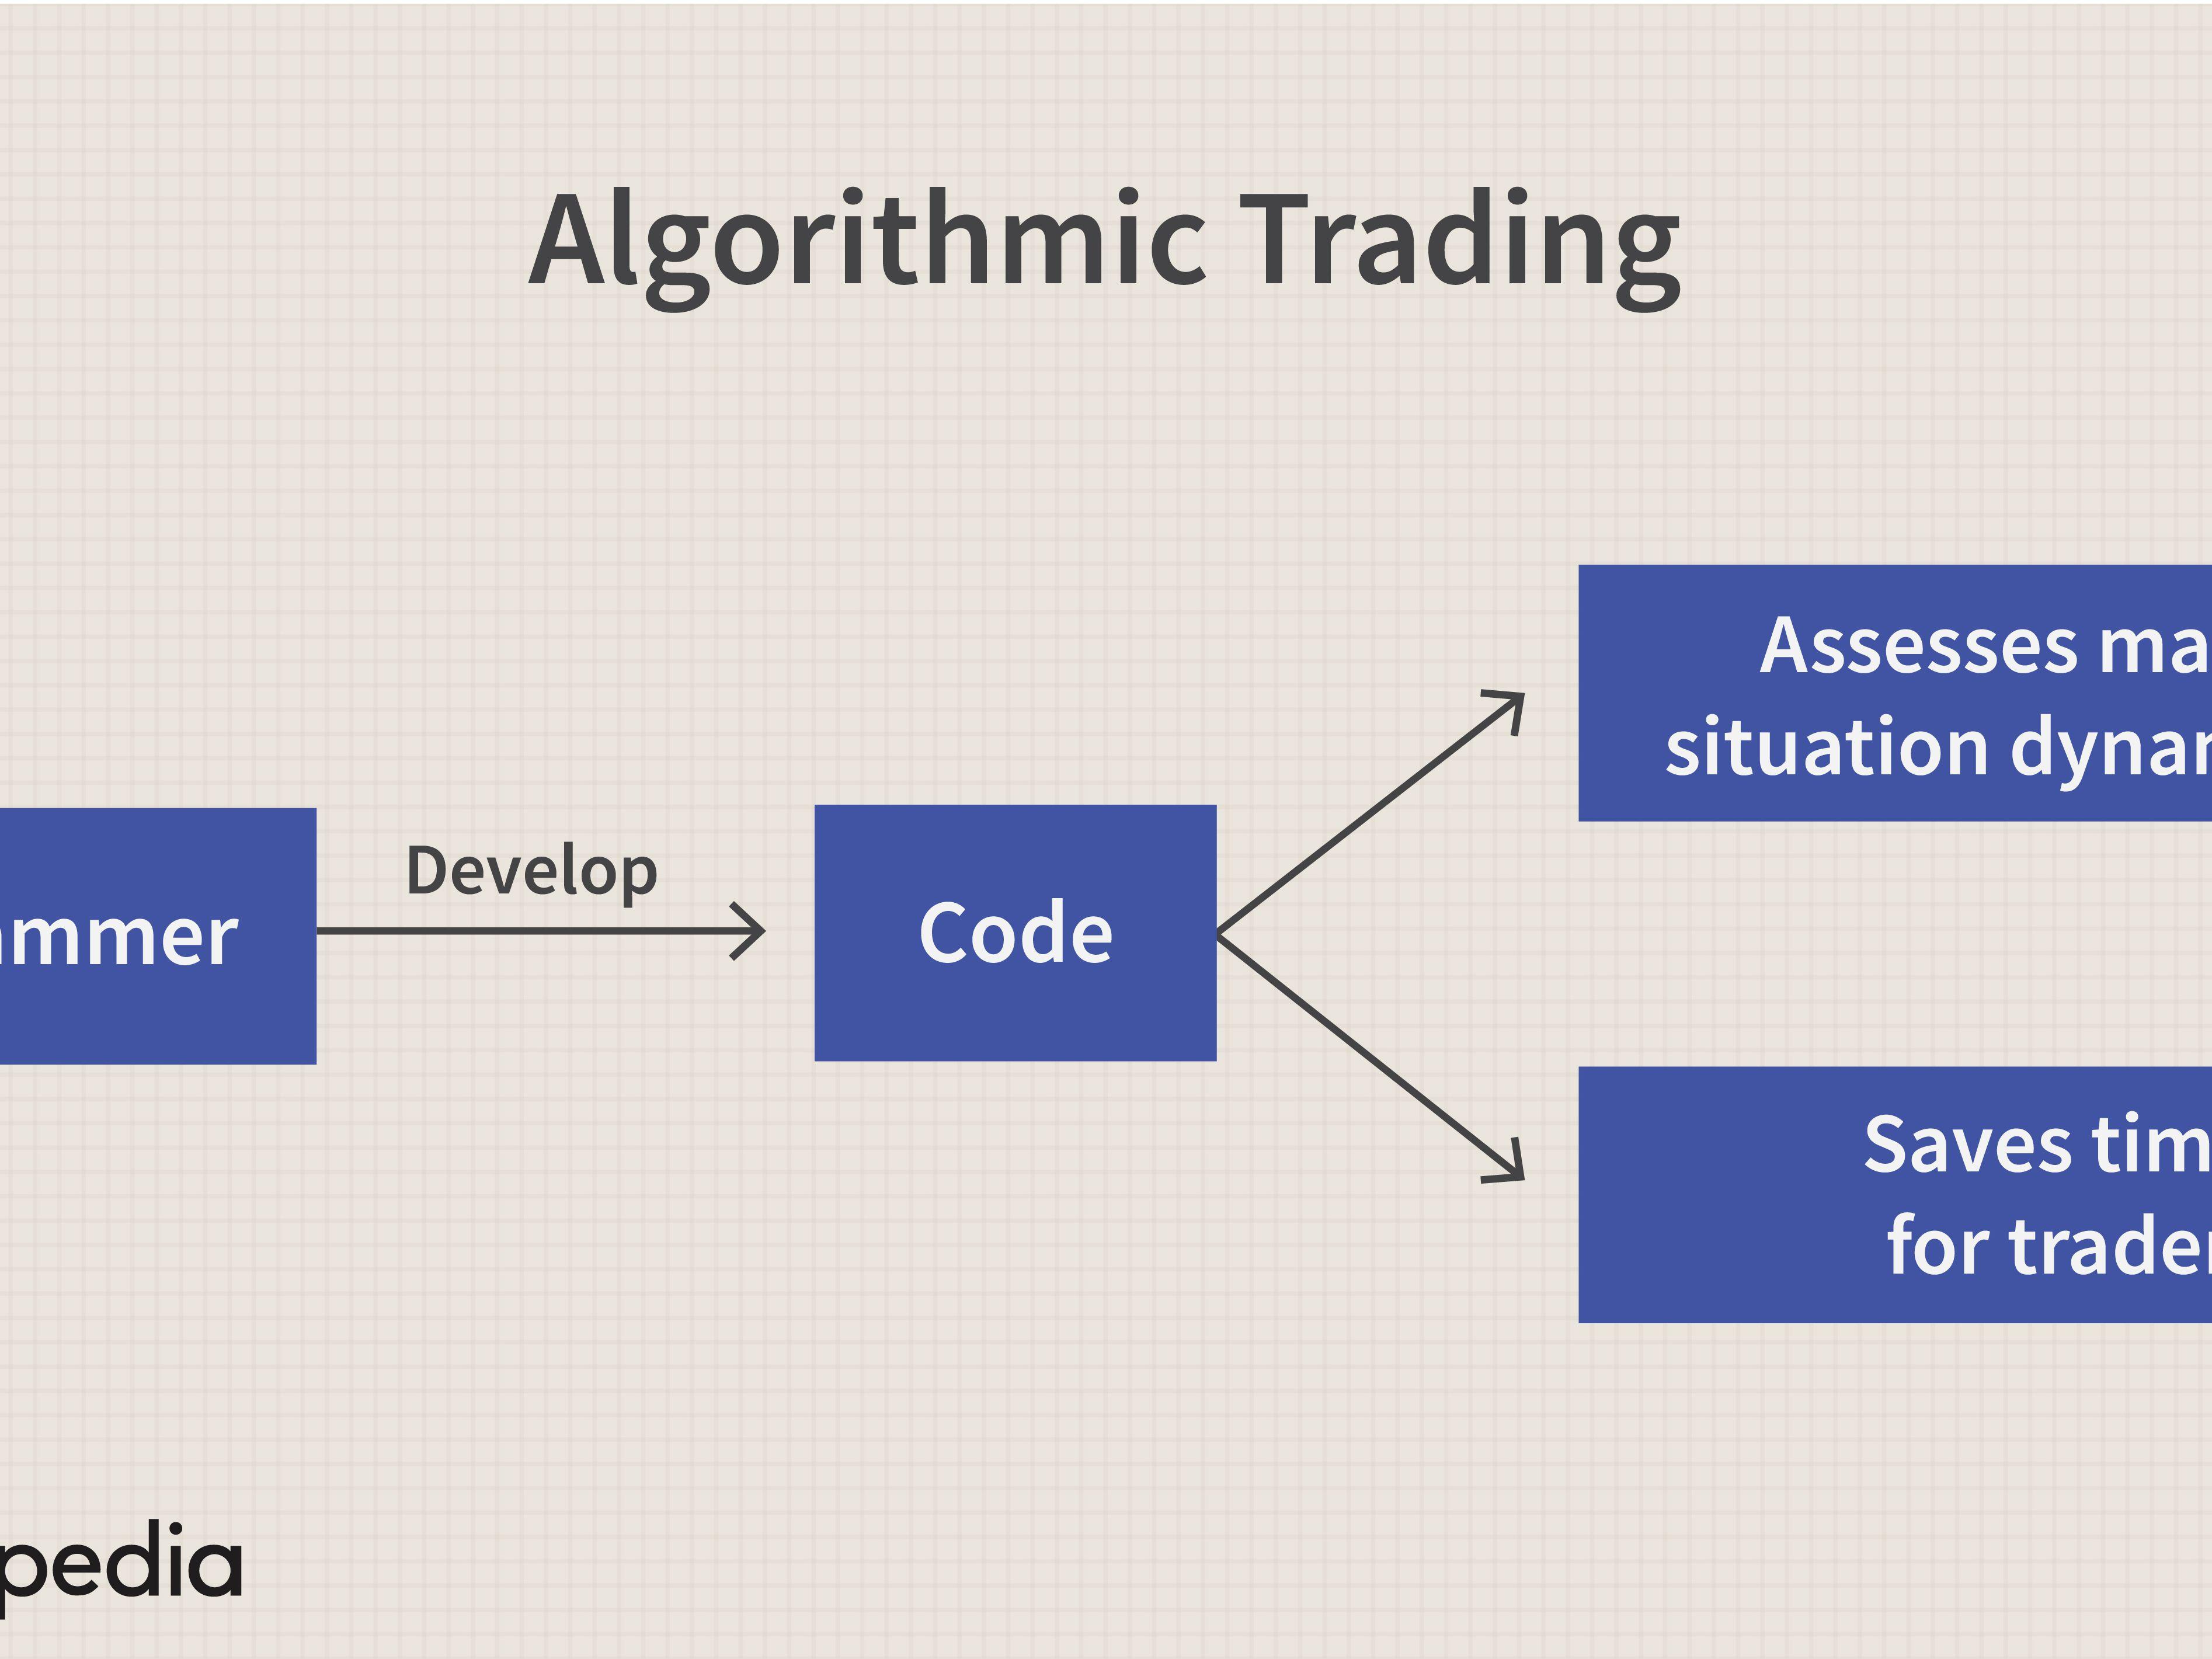 Algorithmic Trading Definition